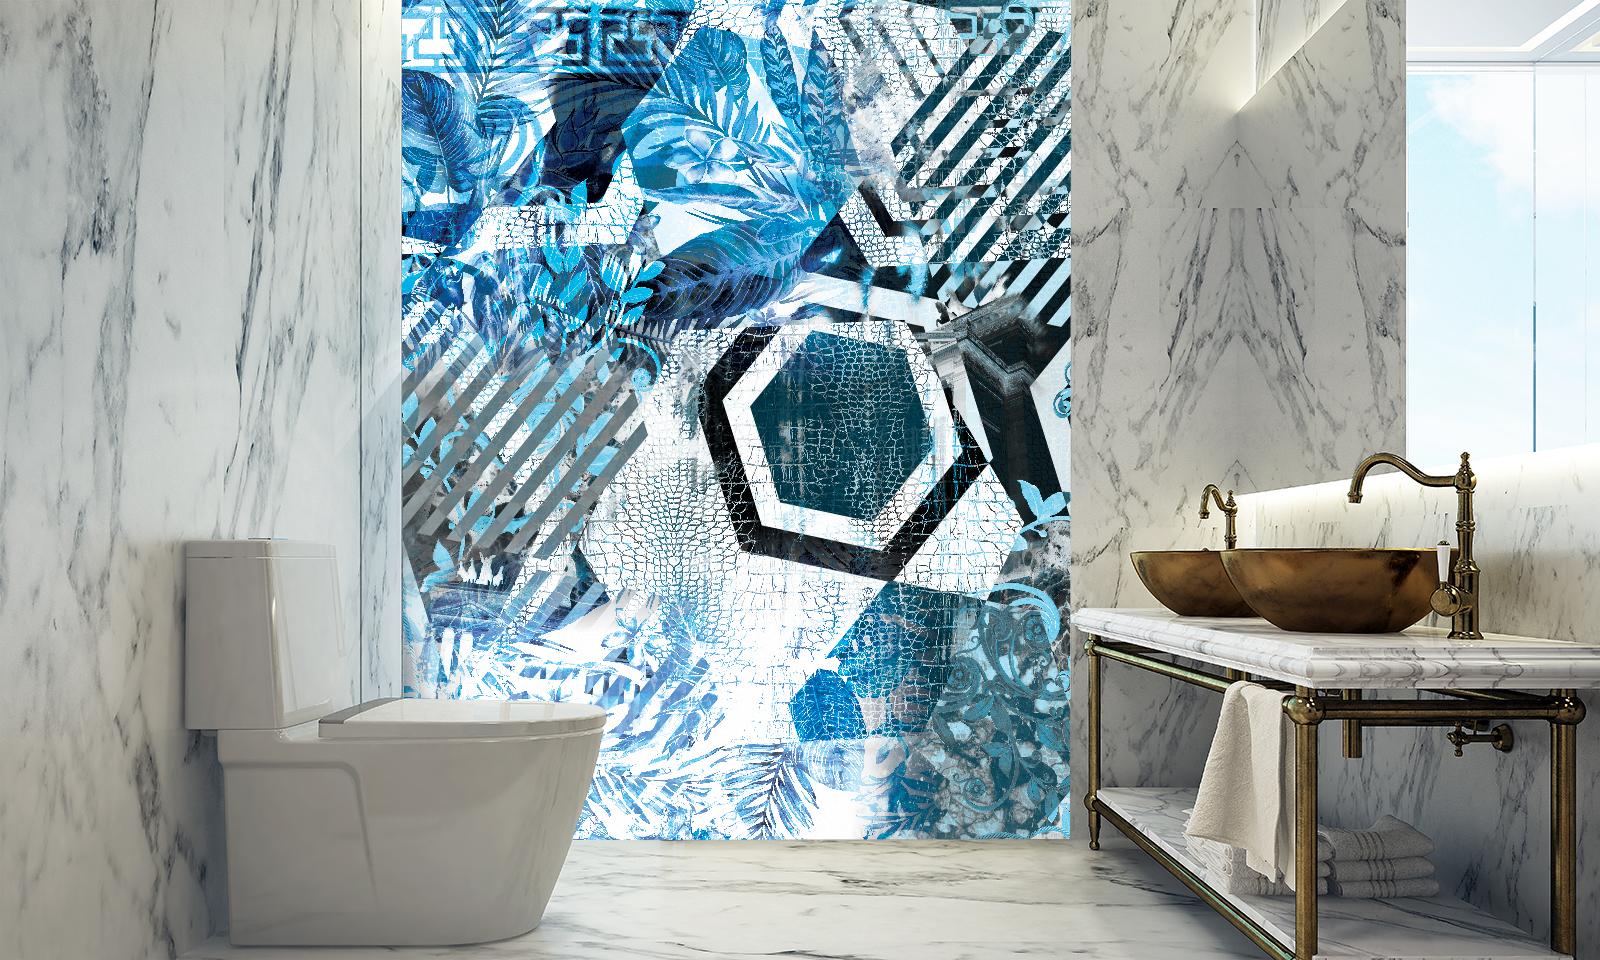 6 Decor Ideas For Your Bathroom Without Removing Tiles Ruvitex Bathroom Wall Decor Ruvitex 3d Decors Ruvimat Ruvitex Armofol Ruviflex Rdc Regional Distribution Company Eood